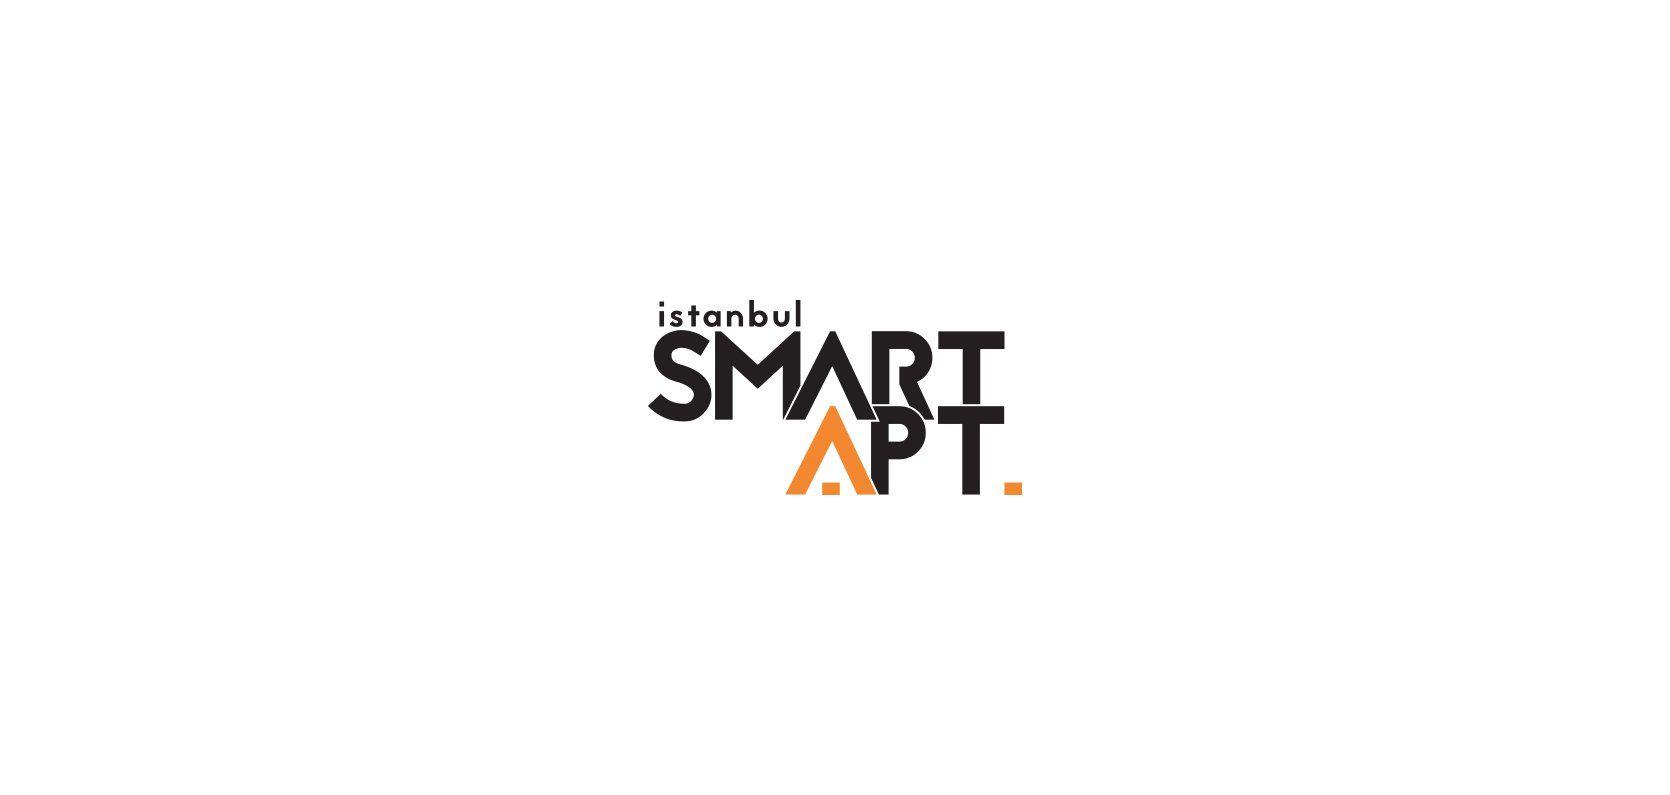 Istanbul Smartapt